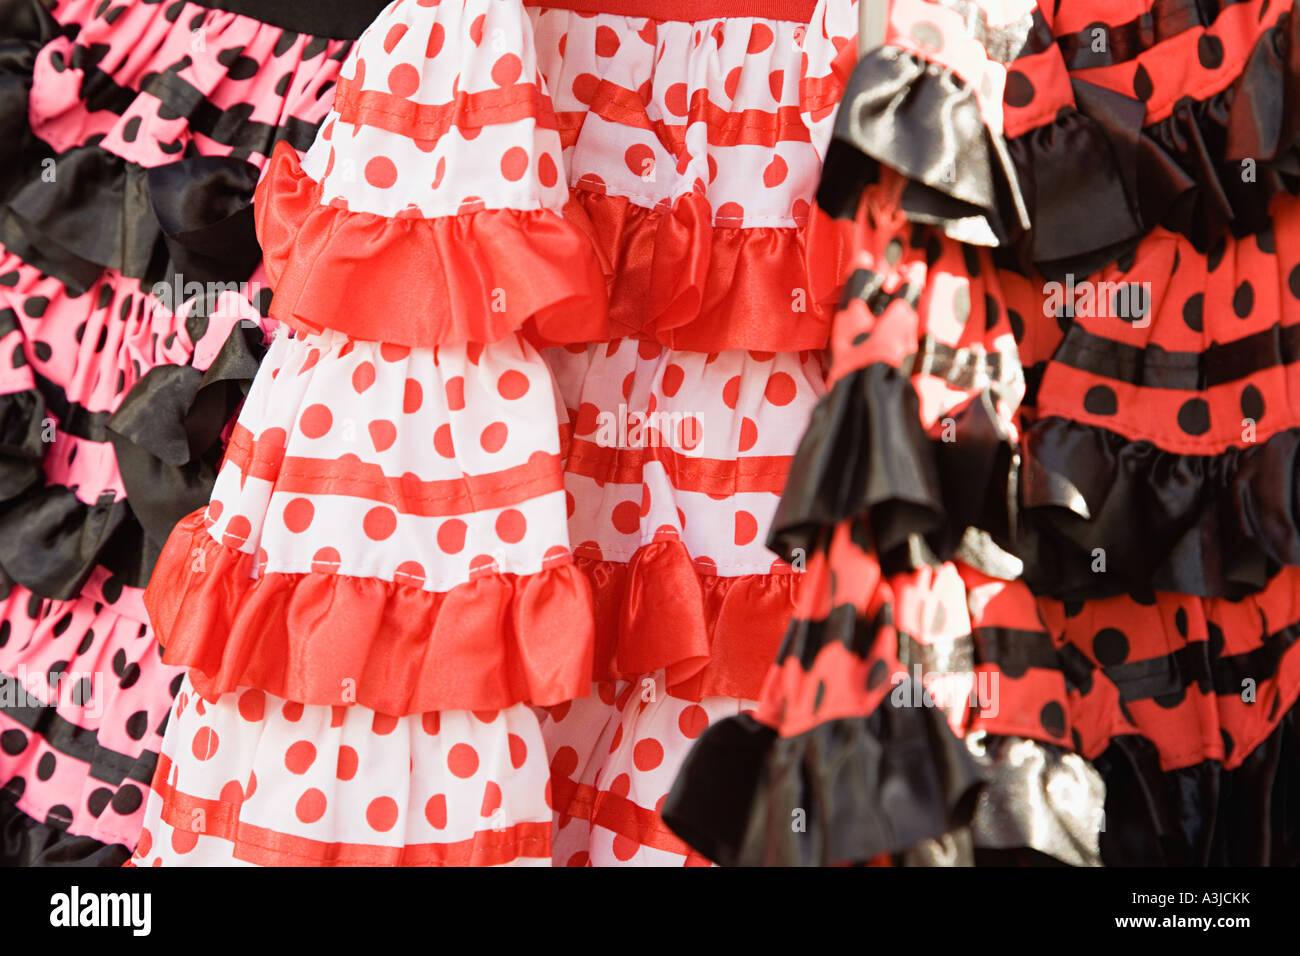 Flamenco dresses - Stock Image